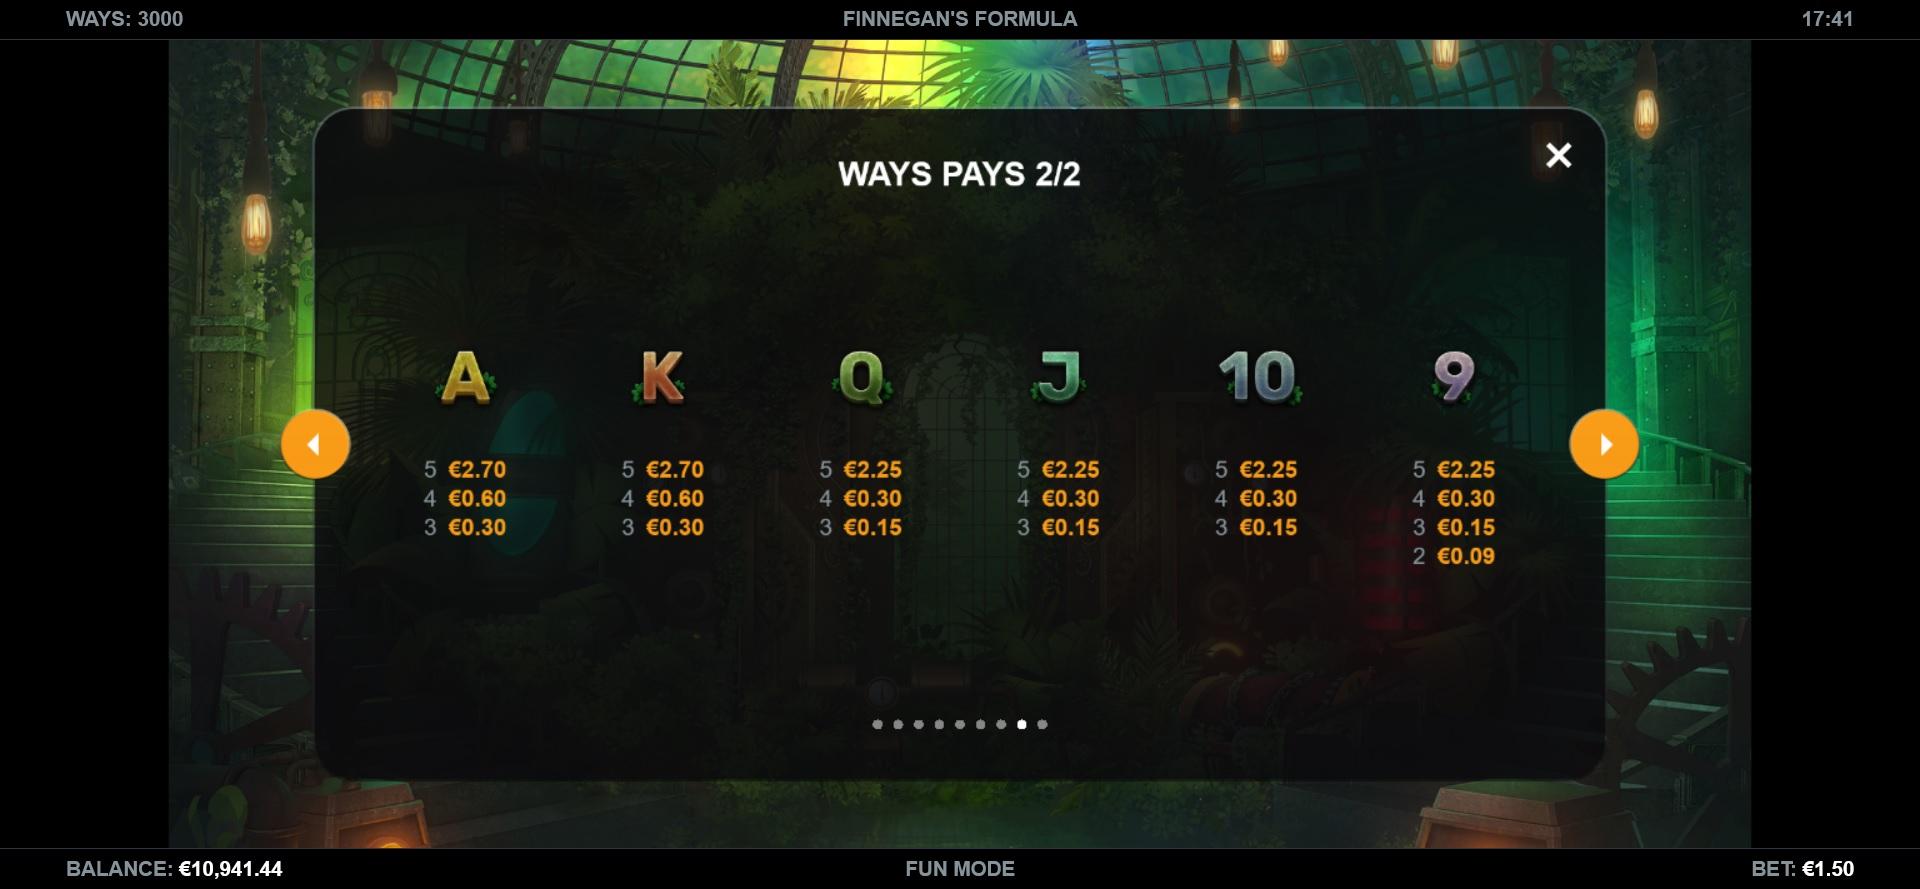 Finnegan's Formula Paytable 2